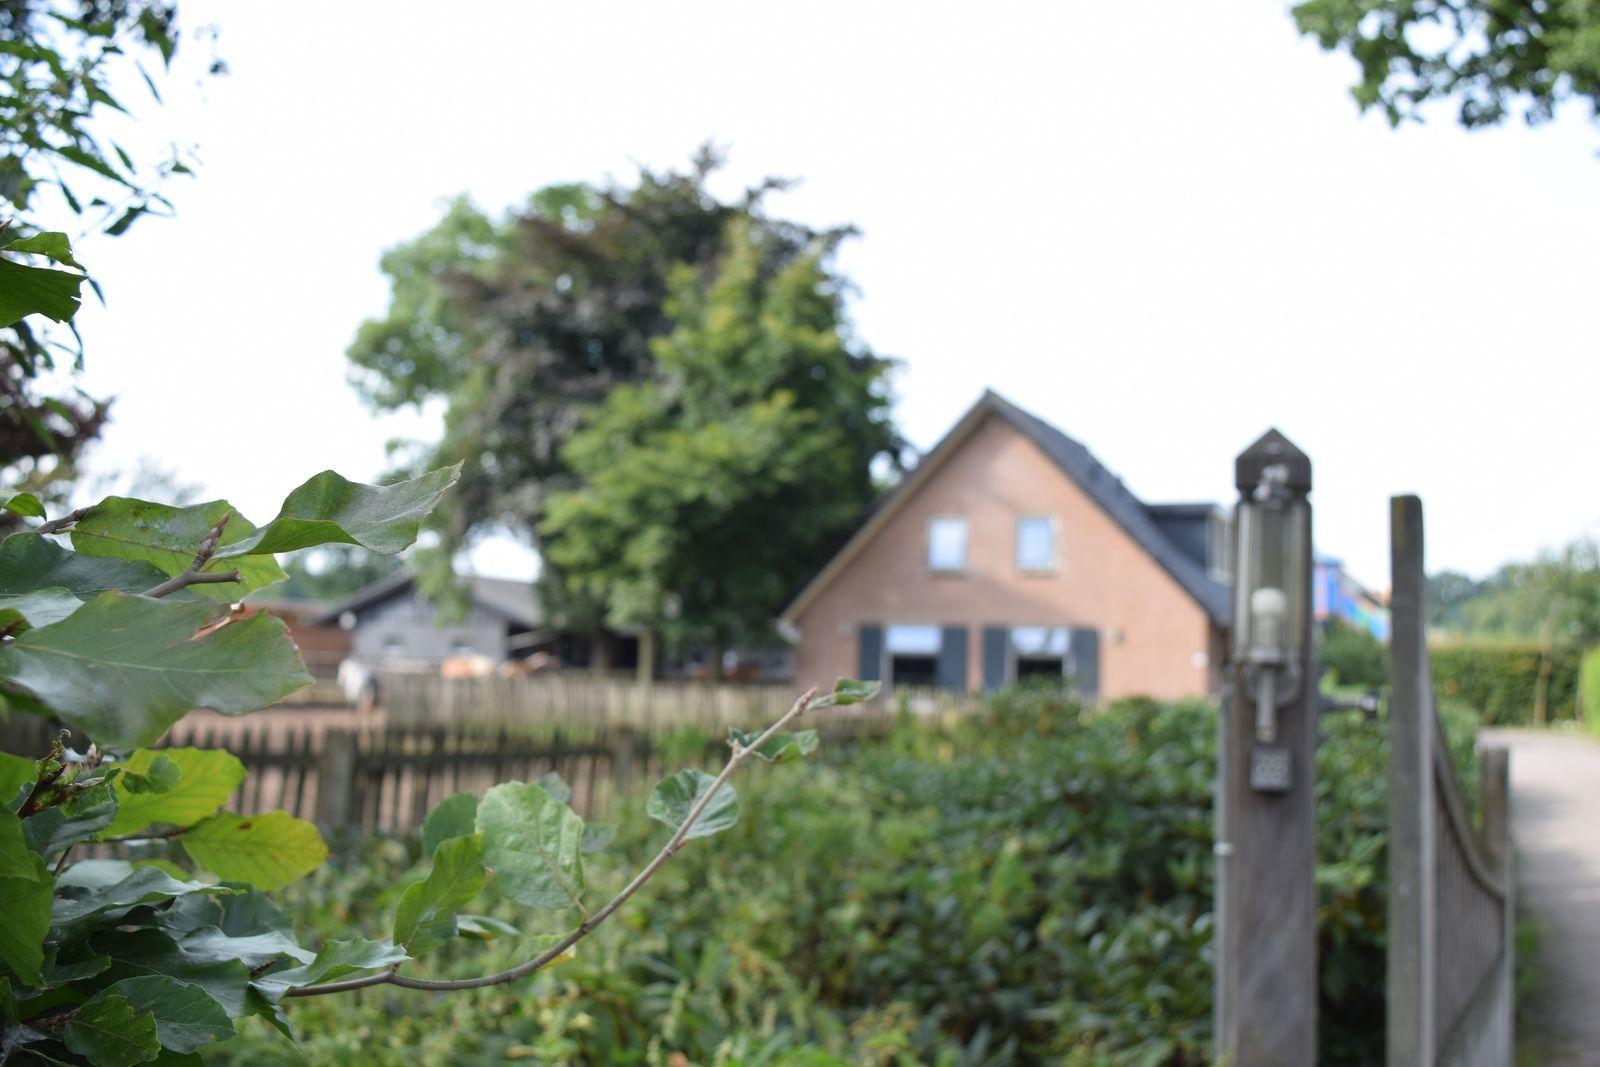 20-persoons Groepsboerderij - de Boshoek